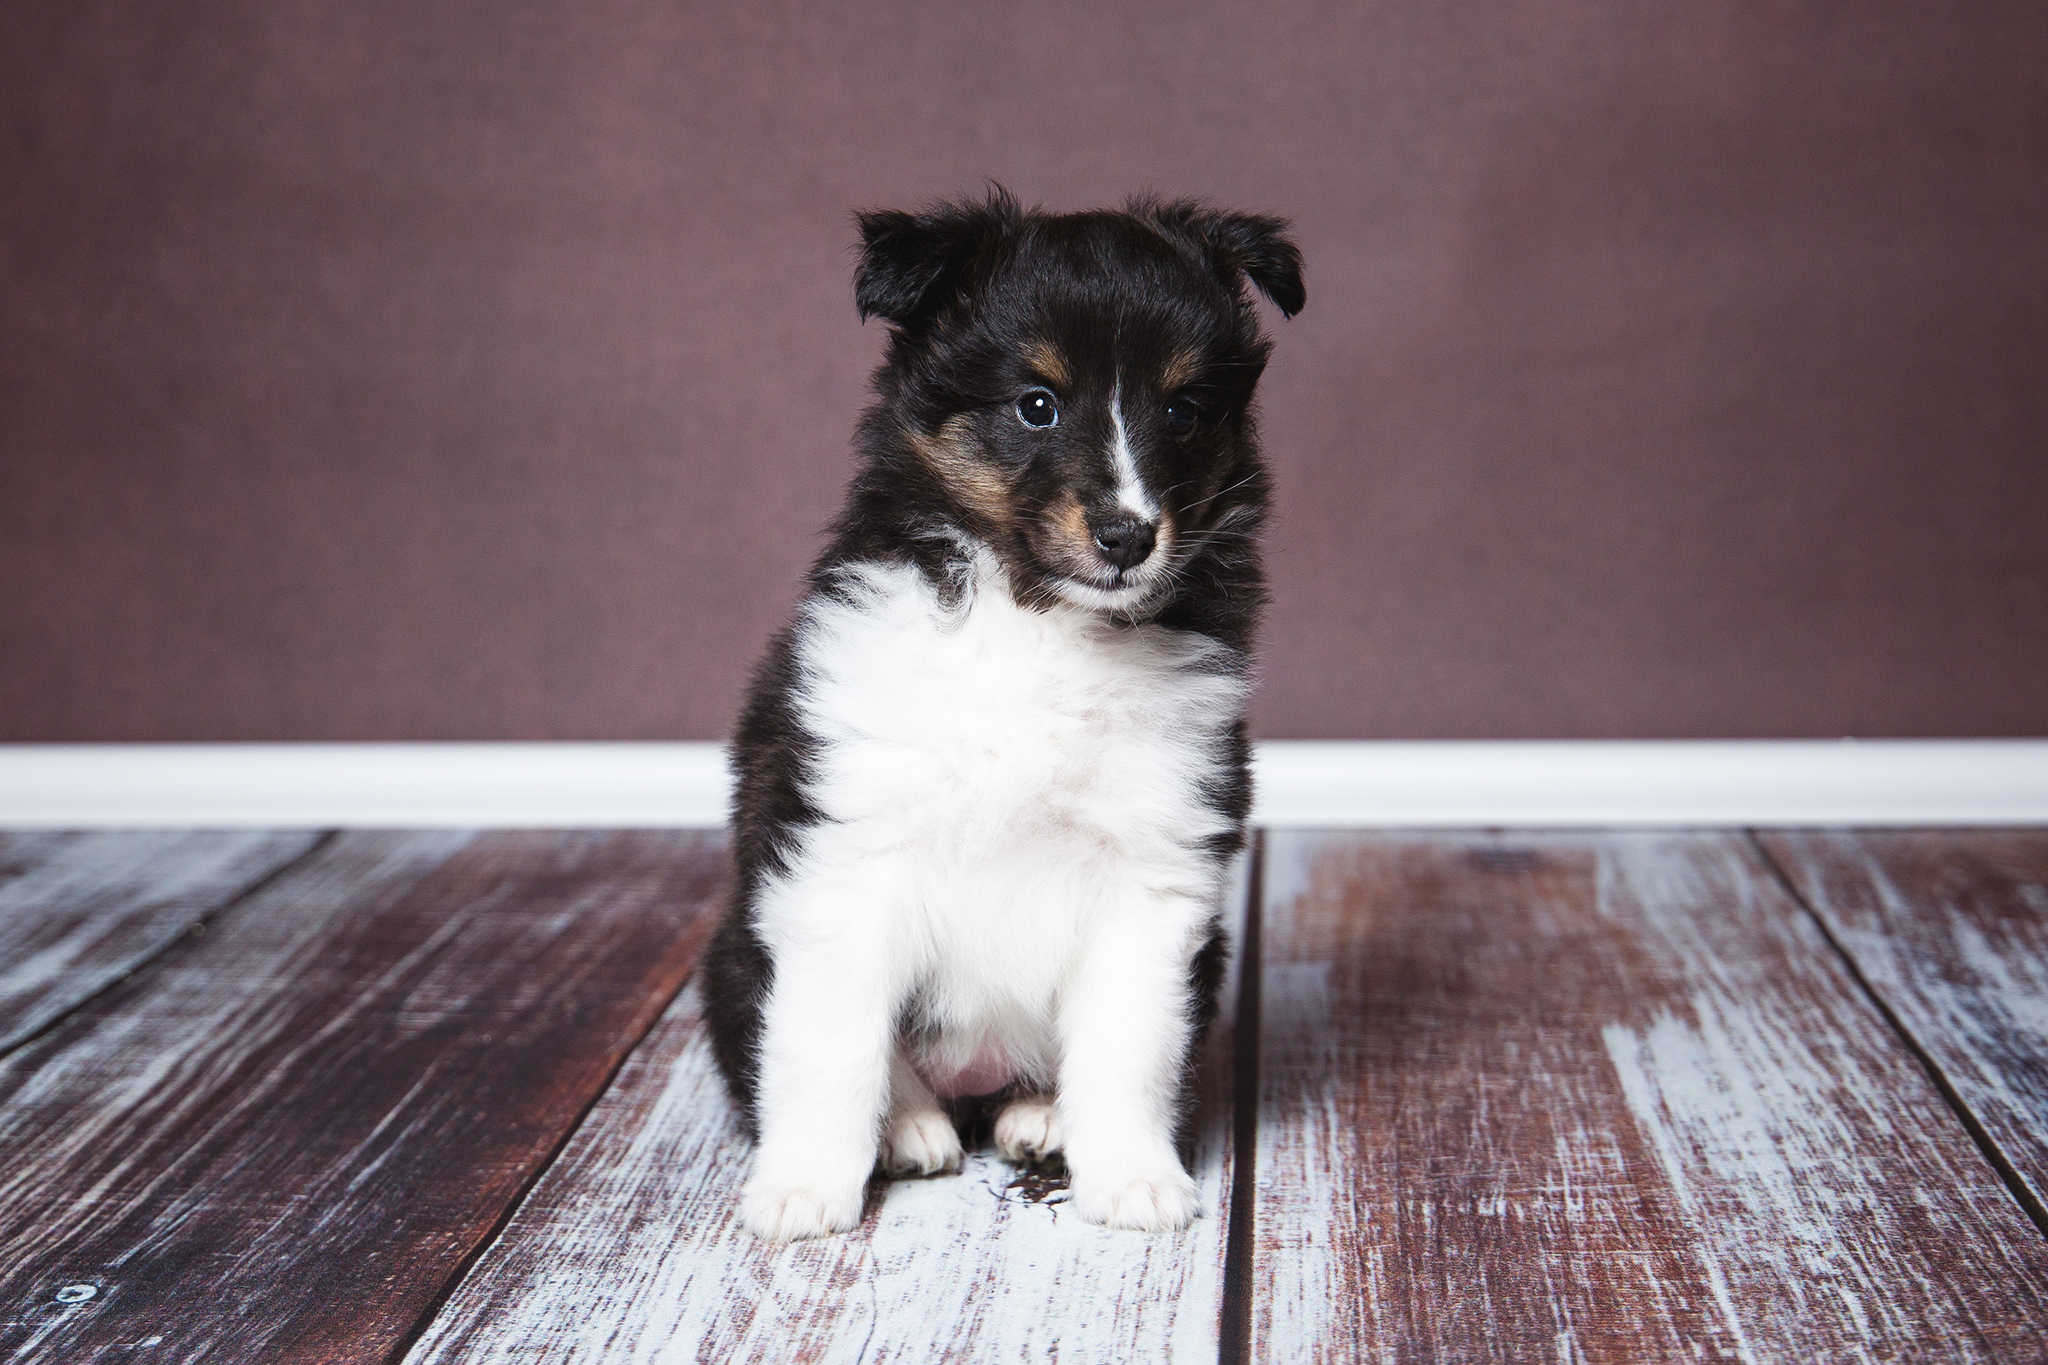 Ginny 6. Wochen alt